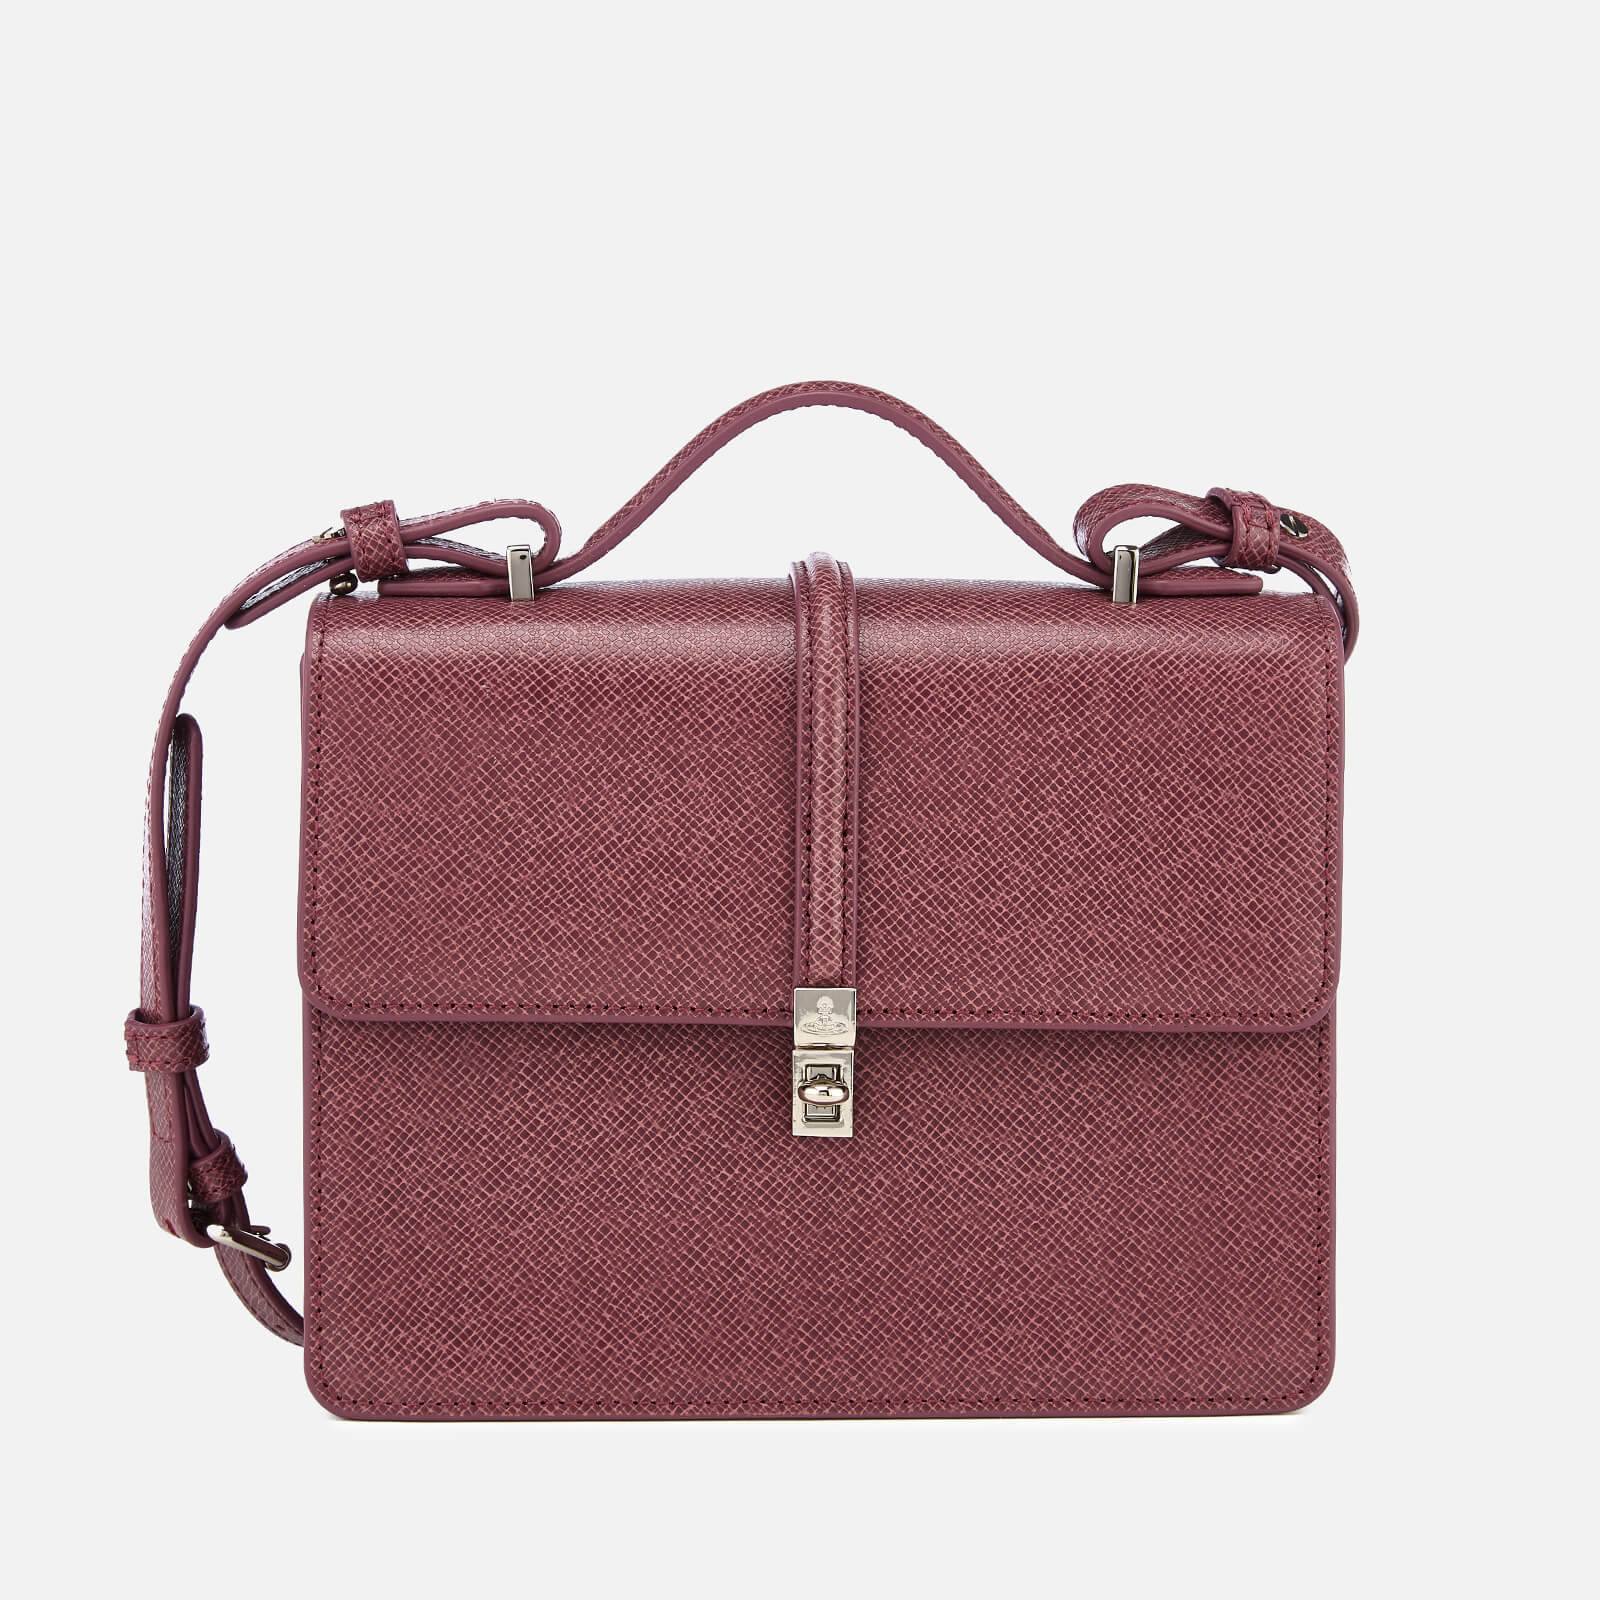 Vivienne Westwood Women s Sofia Medium Shoulder Bag - Pink - Free UK ... 5201d1d7cf92b